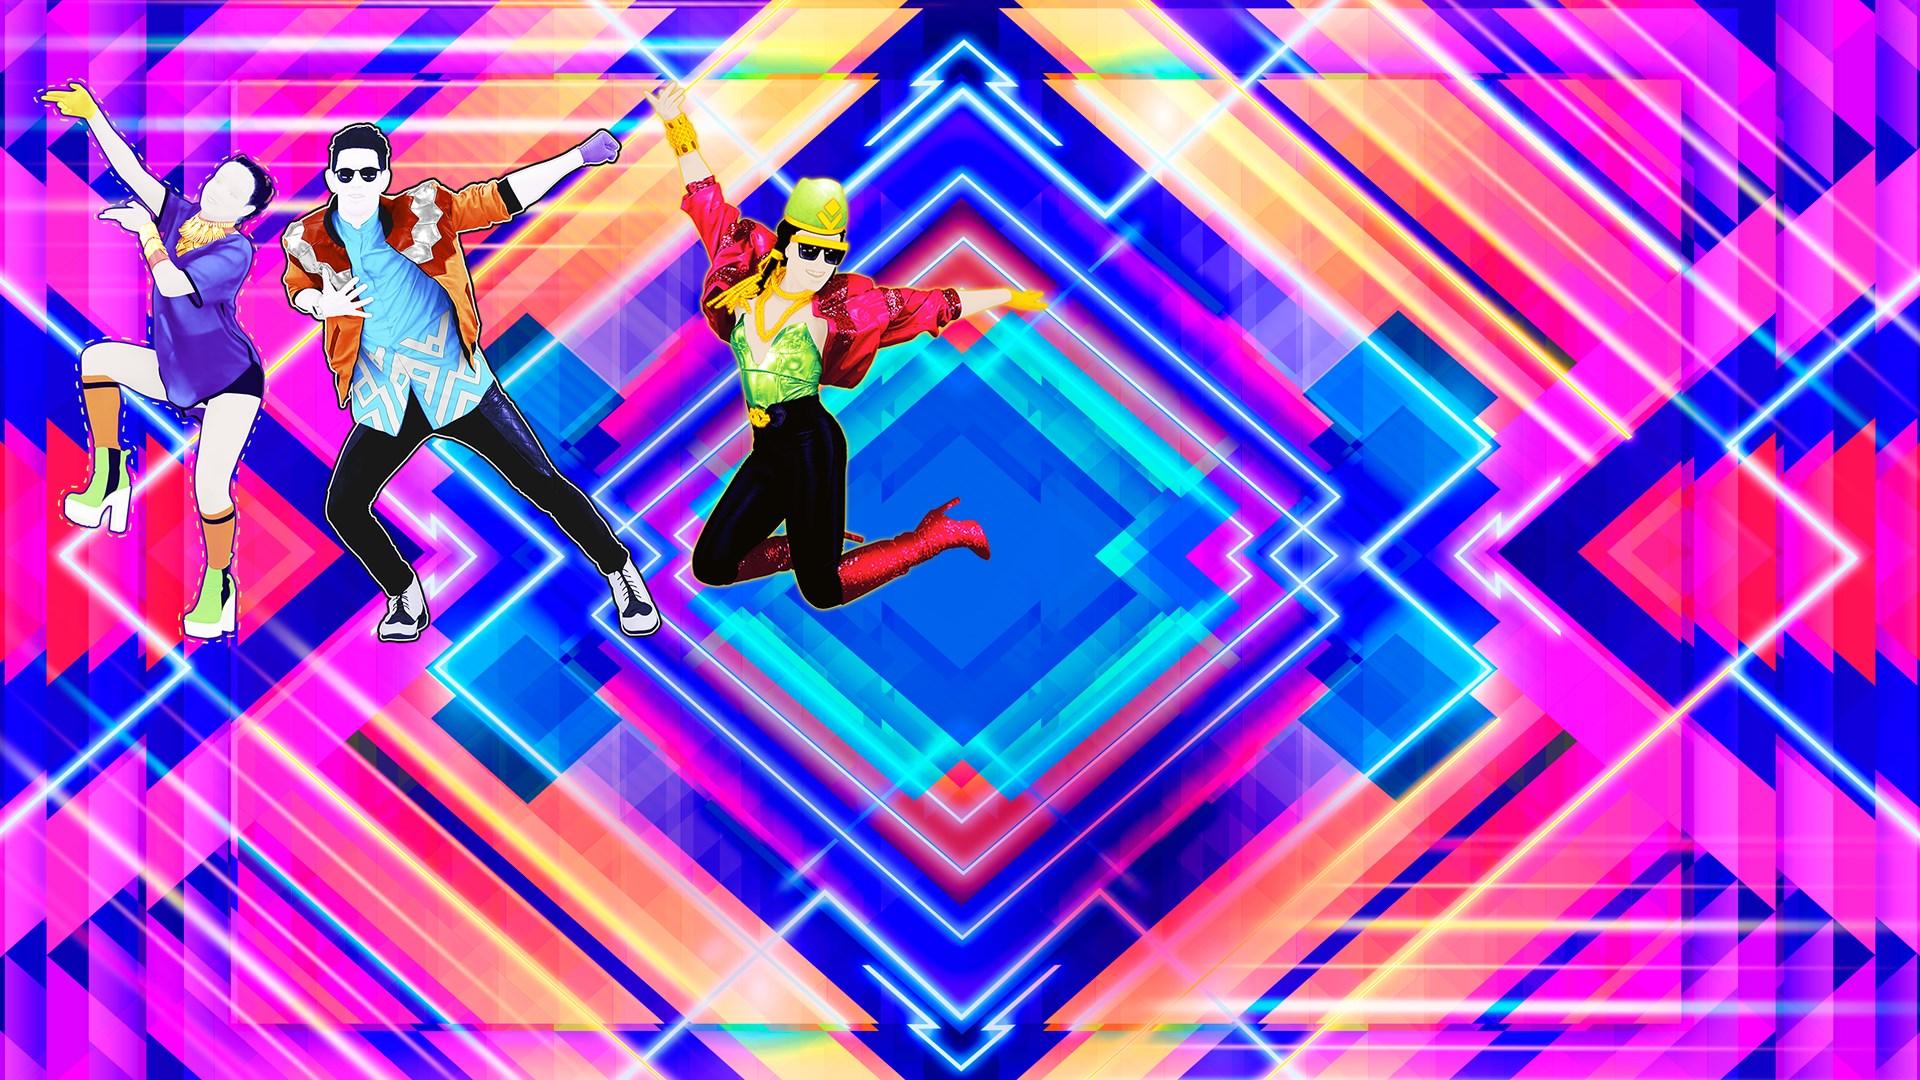 Just dance 2017 wii download iso ita